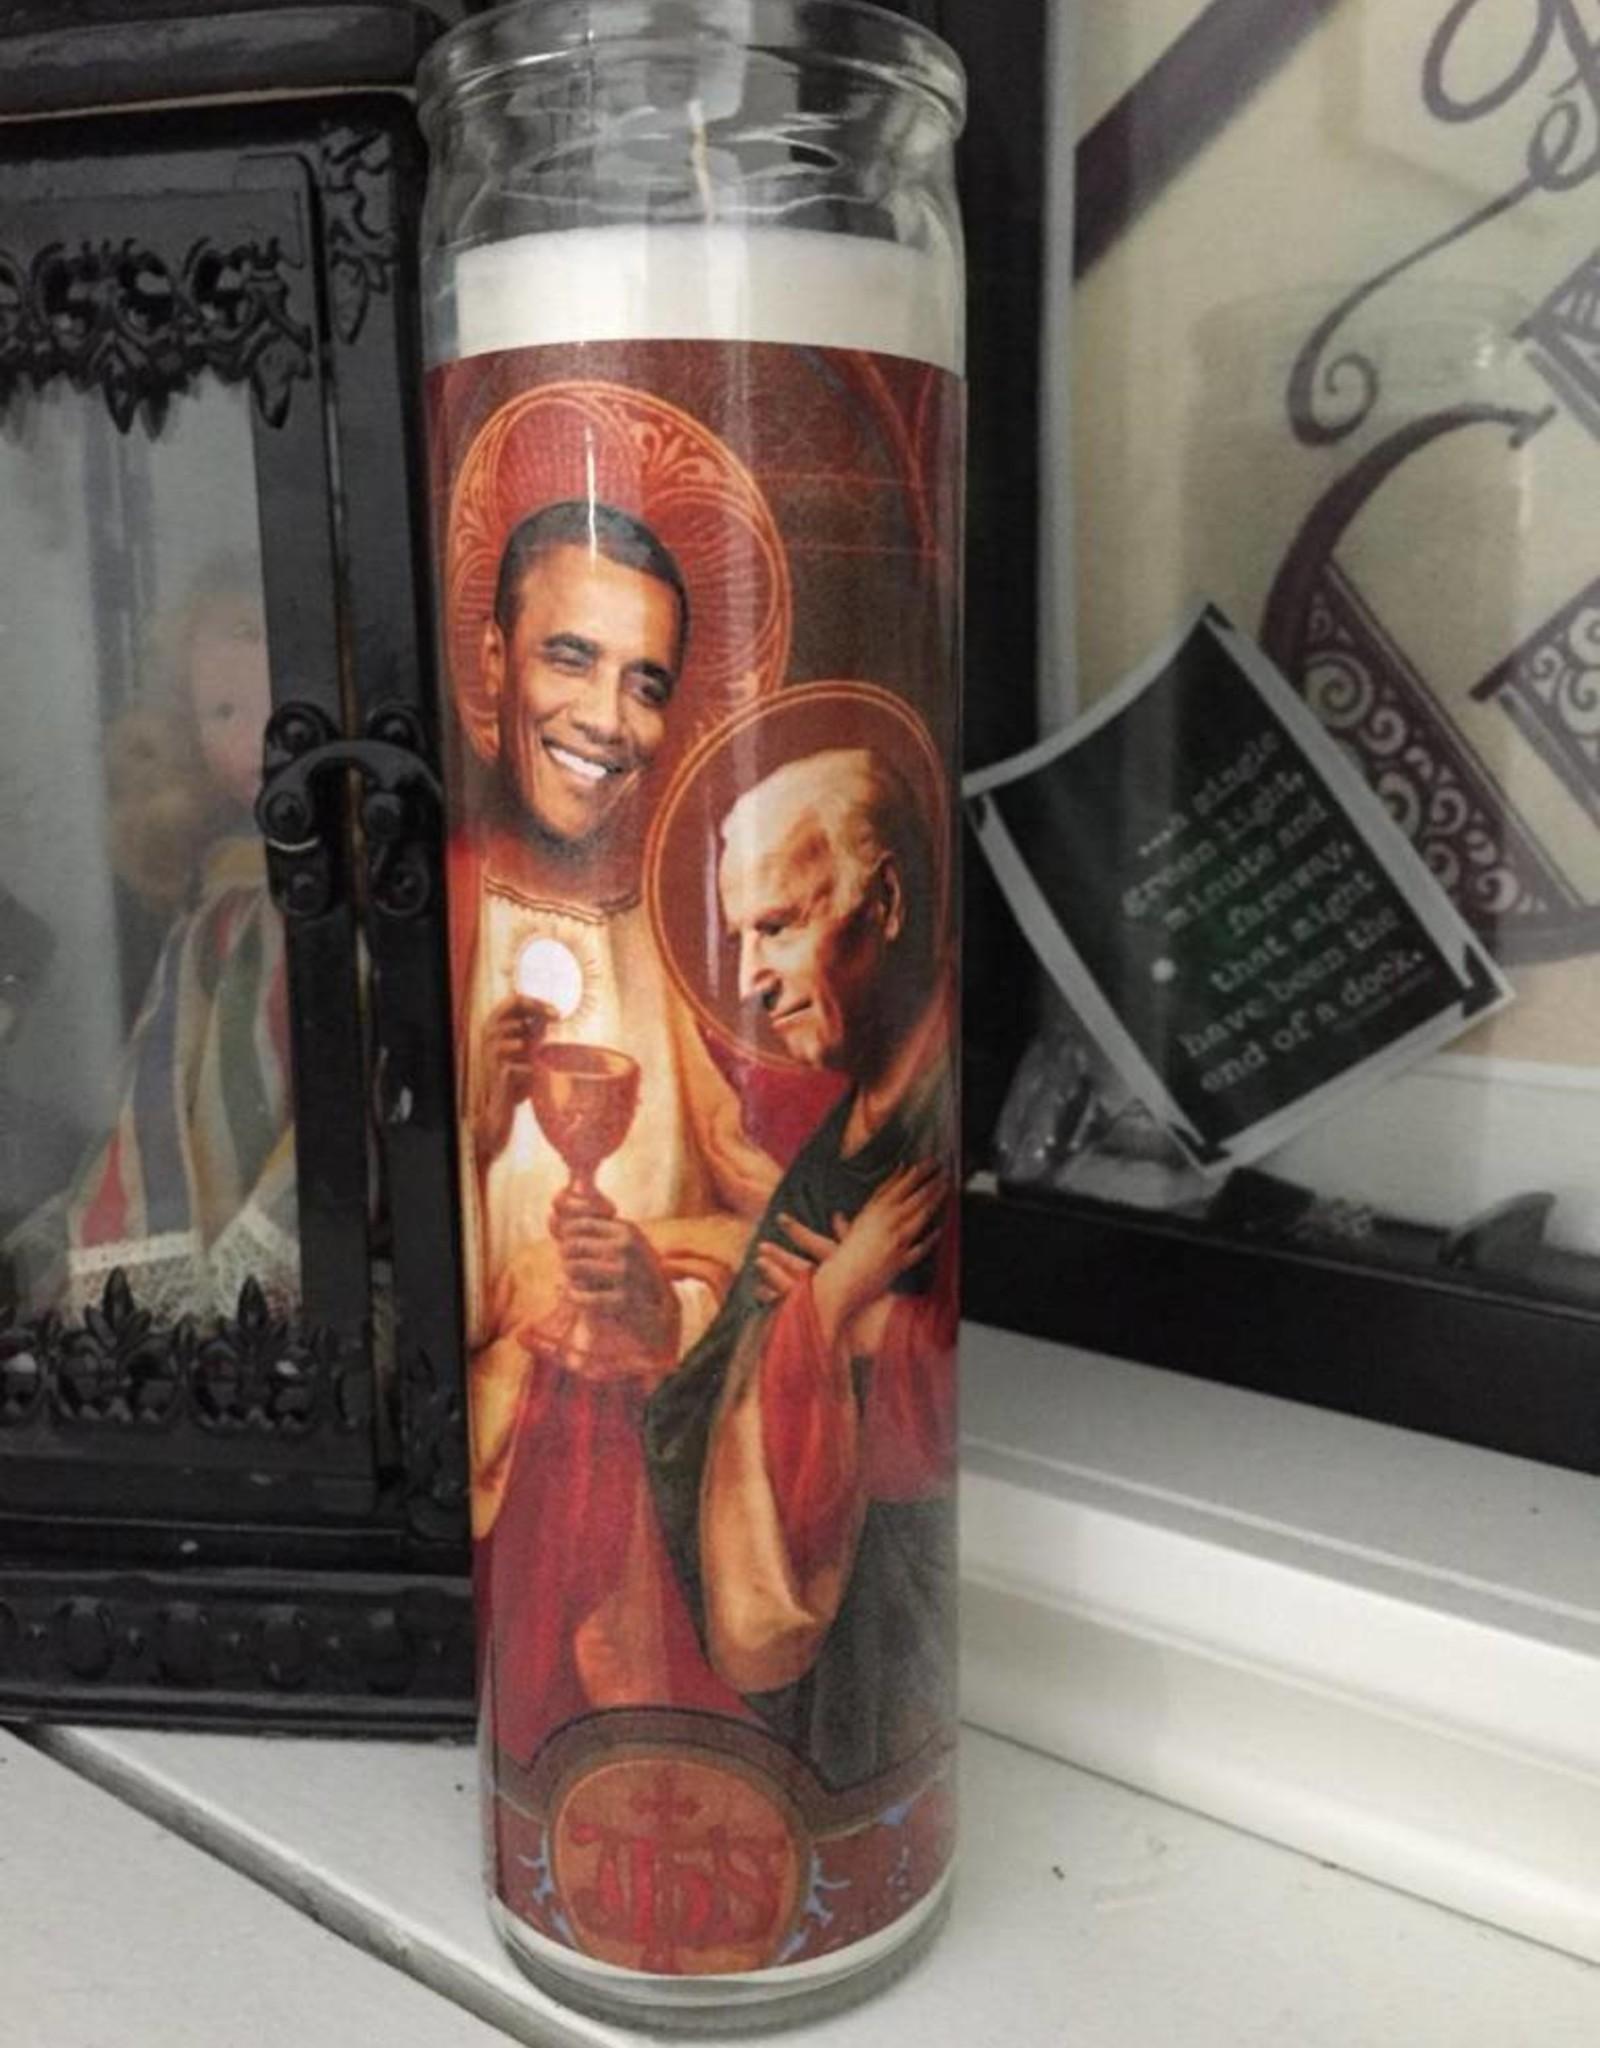 St. Biden & Obama BFF Prayer Candle